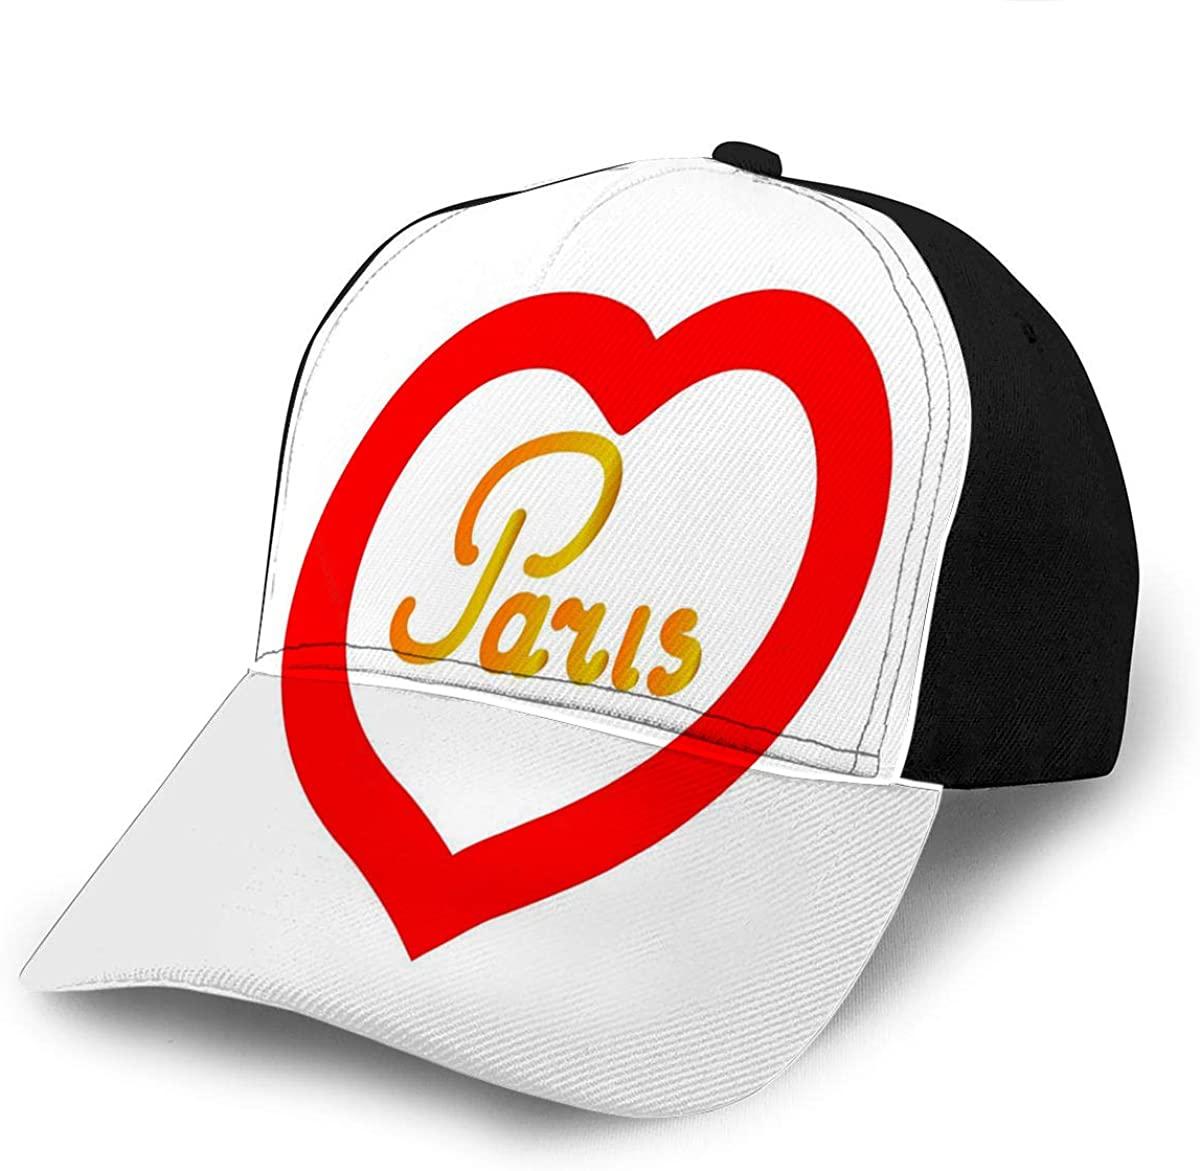 Baseball Caps Hats Heart Around Paris As Symbol of Linked Sports Cap Champion Ha